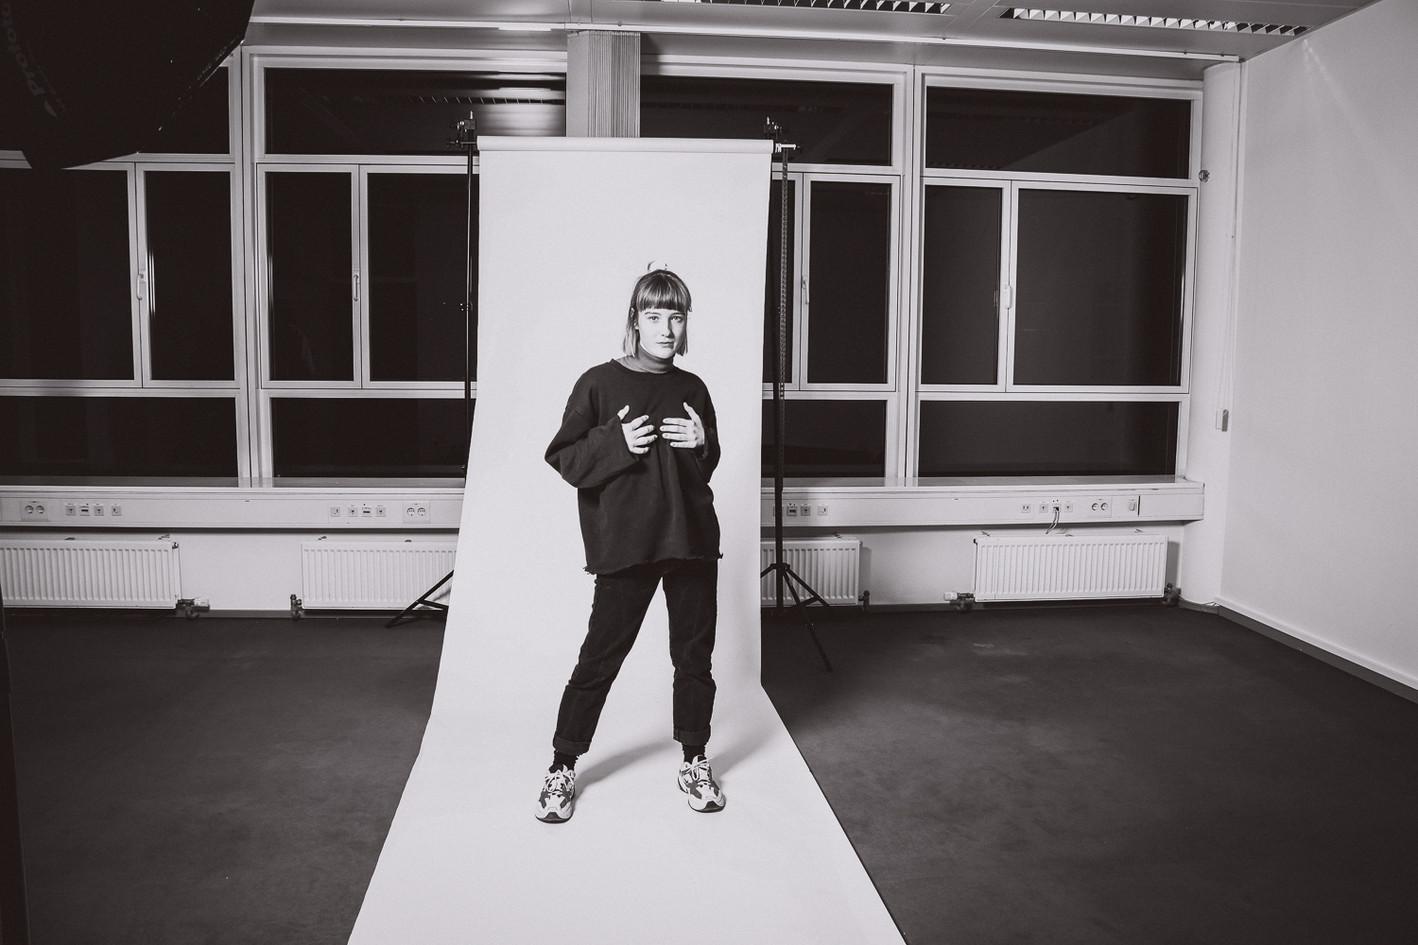 Lena Schiller